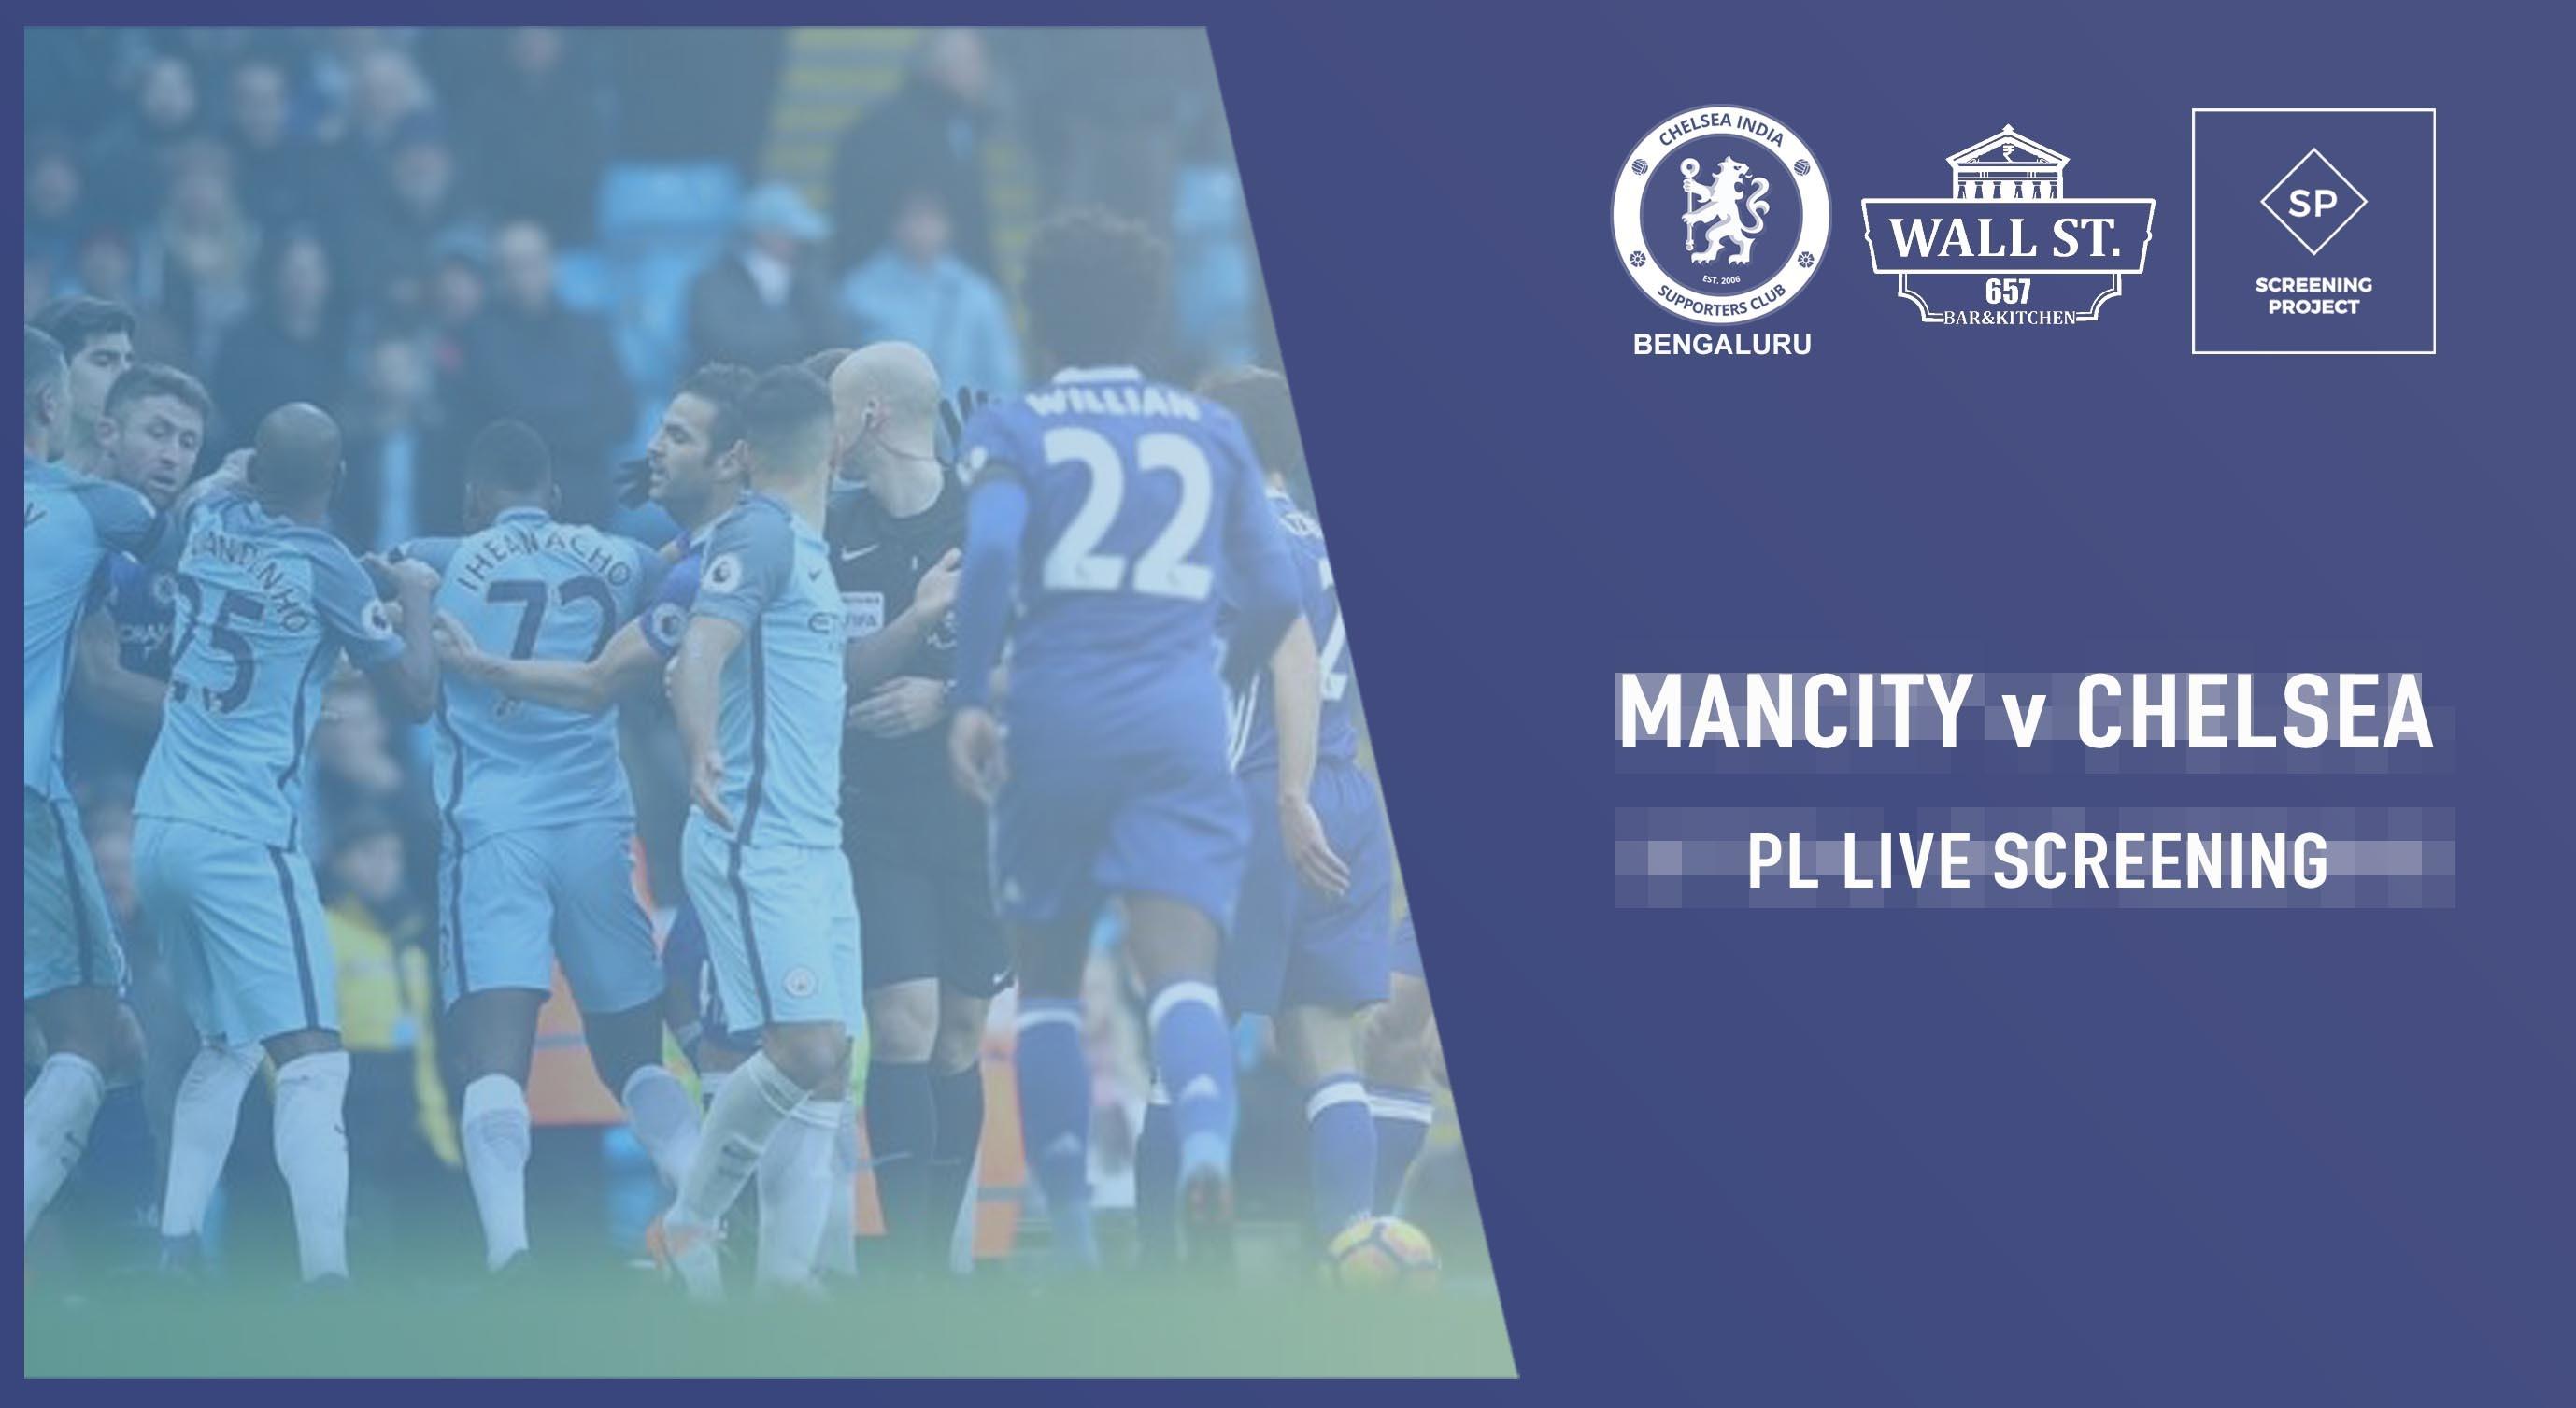 Mancity Vs Chelsea: Book Tickets To Mancity V Chelsea Official CISC Bangalore